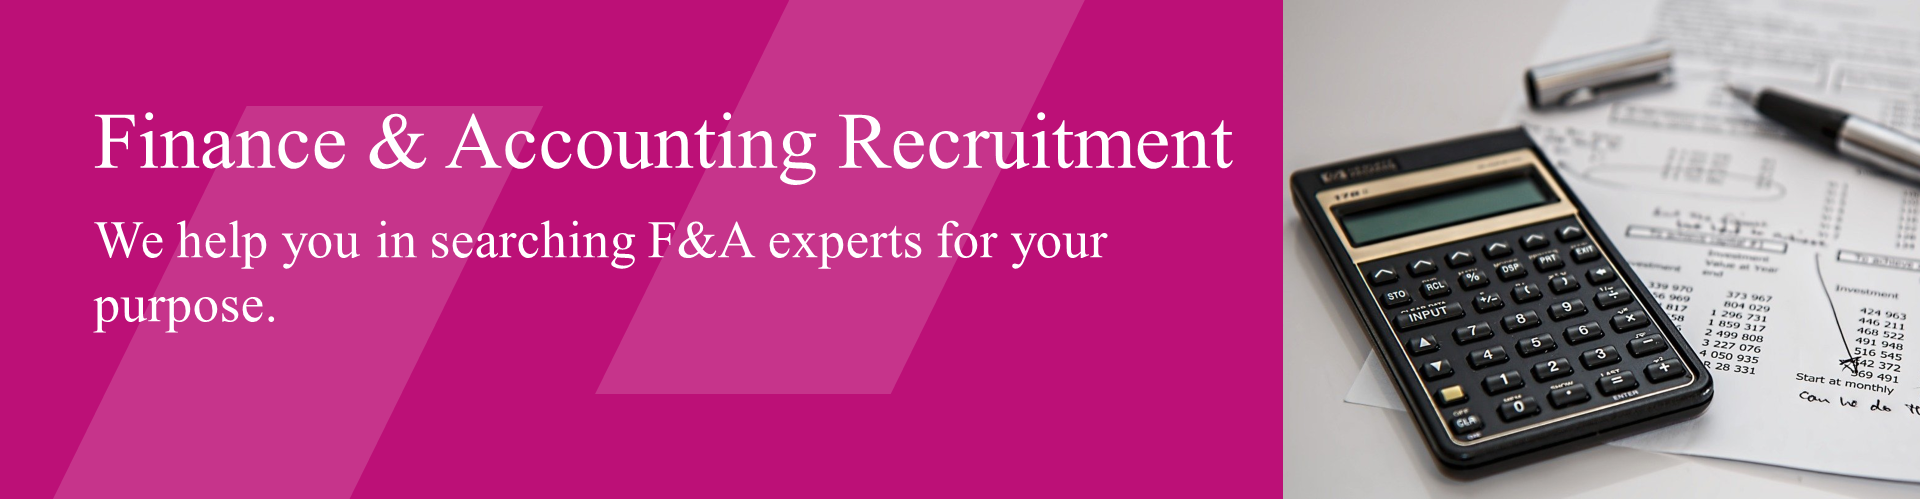 Finance & Accounting Recruitment